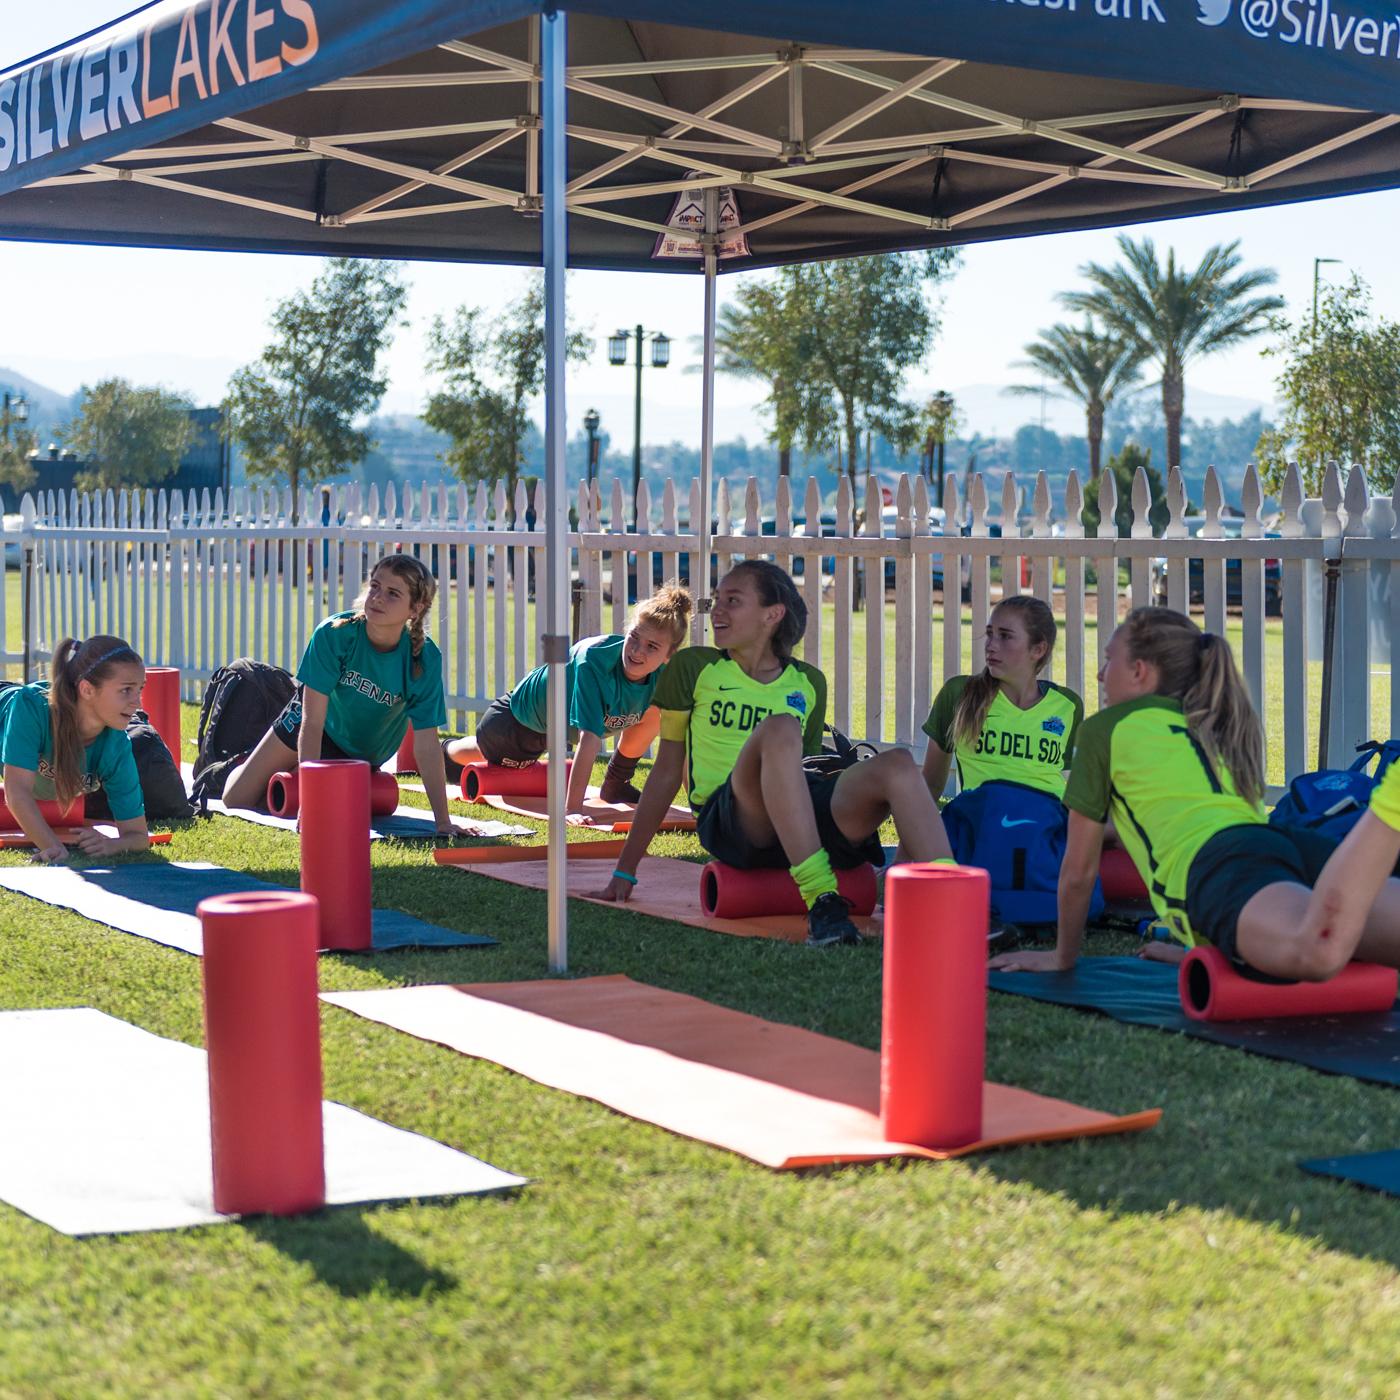 The Players Lounge+ - SilverlakesTournament.com